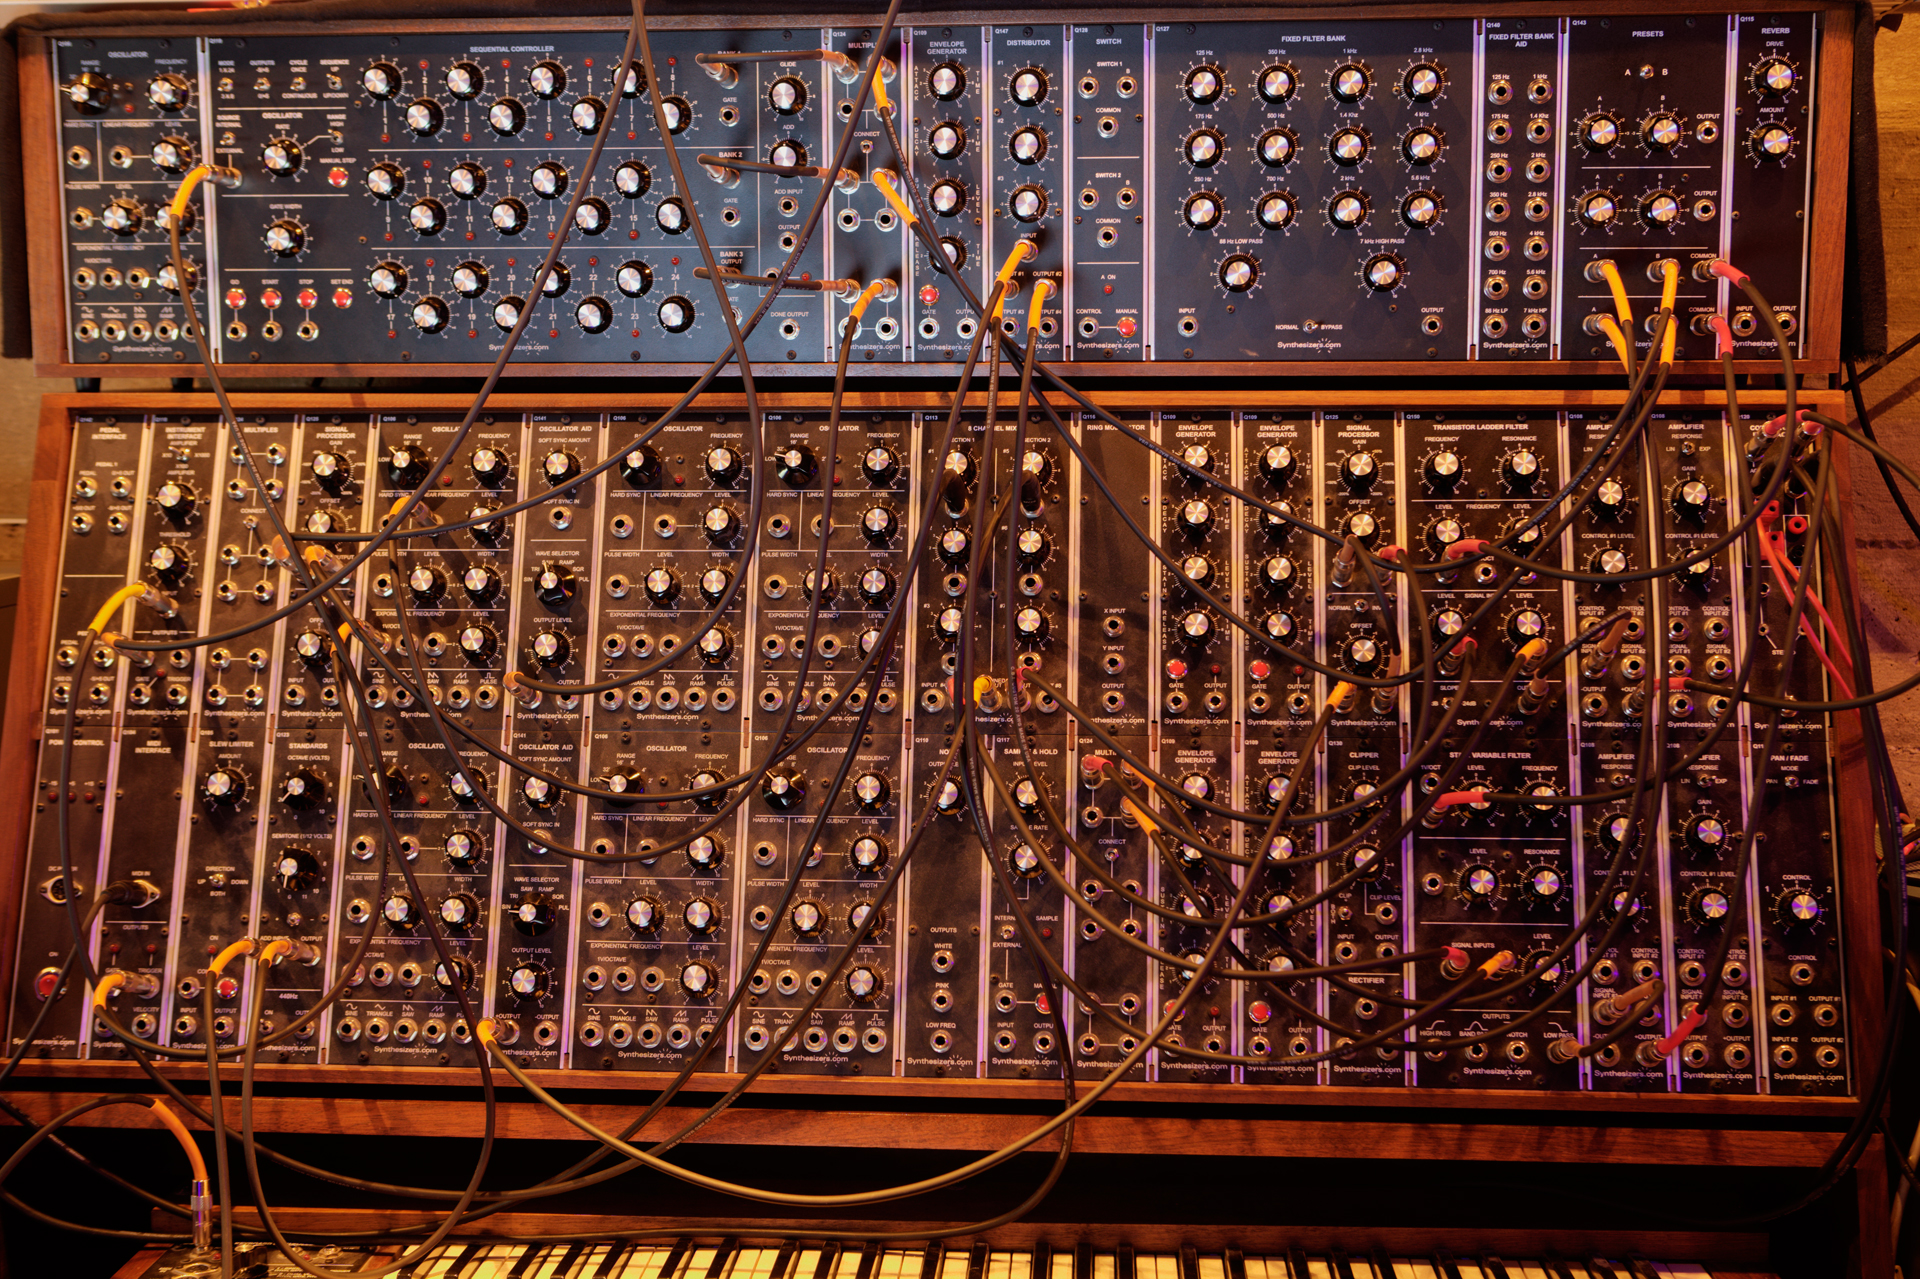 Moog Synthesizer Wallpaper 39934 Usbdata